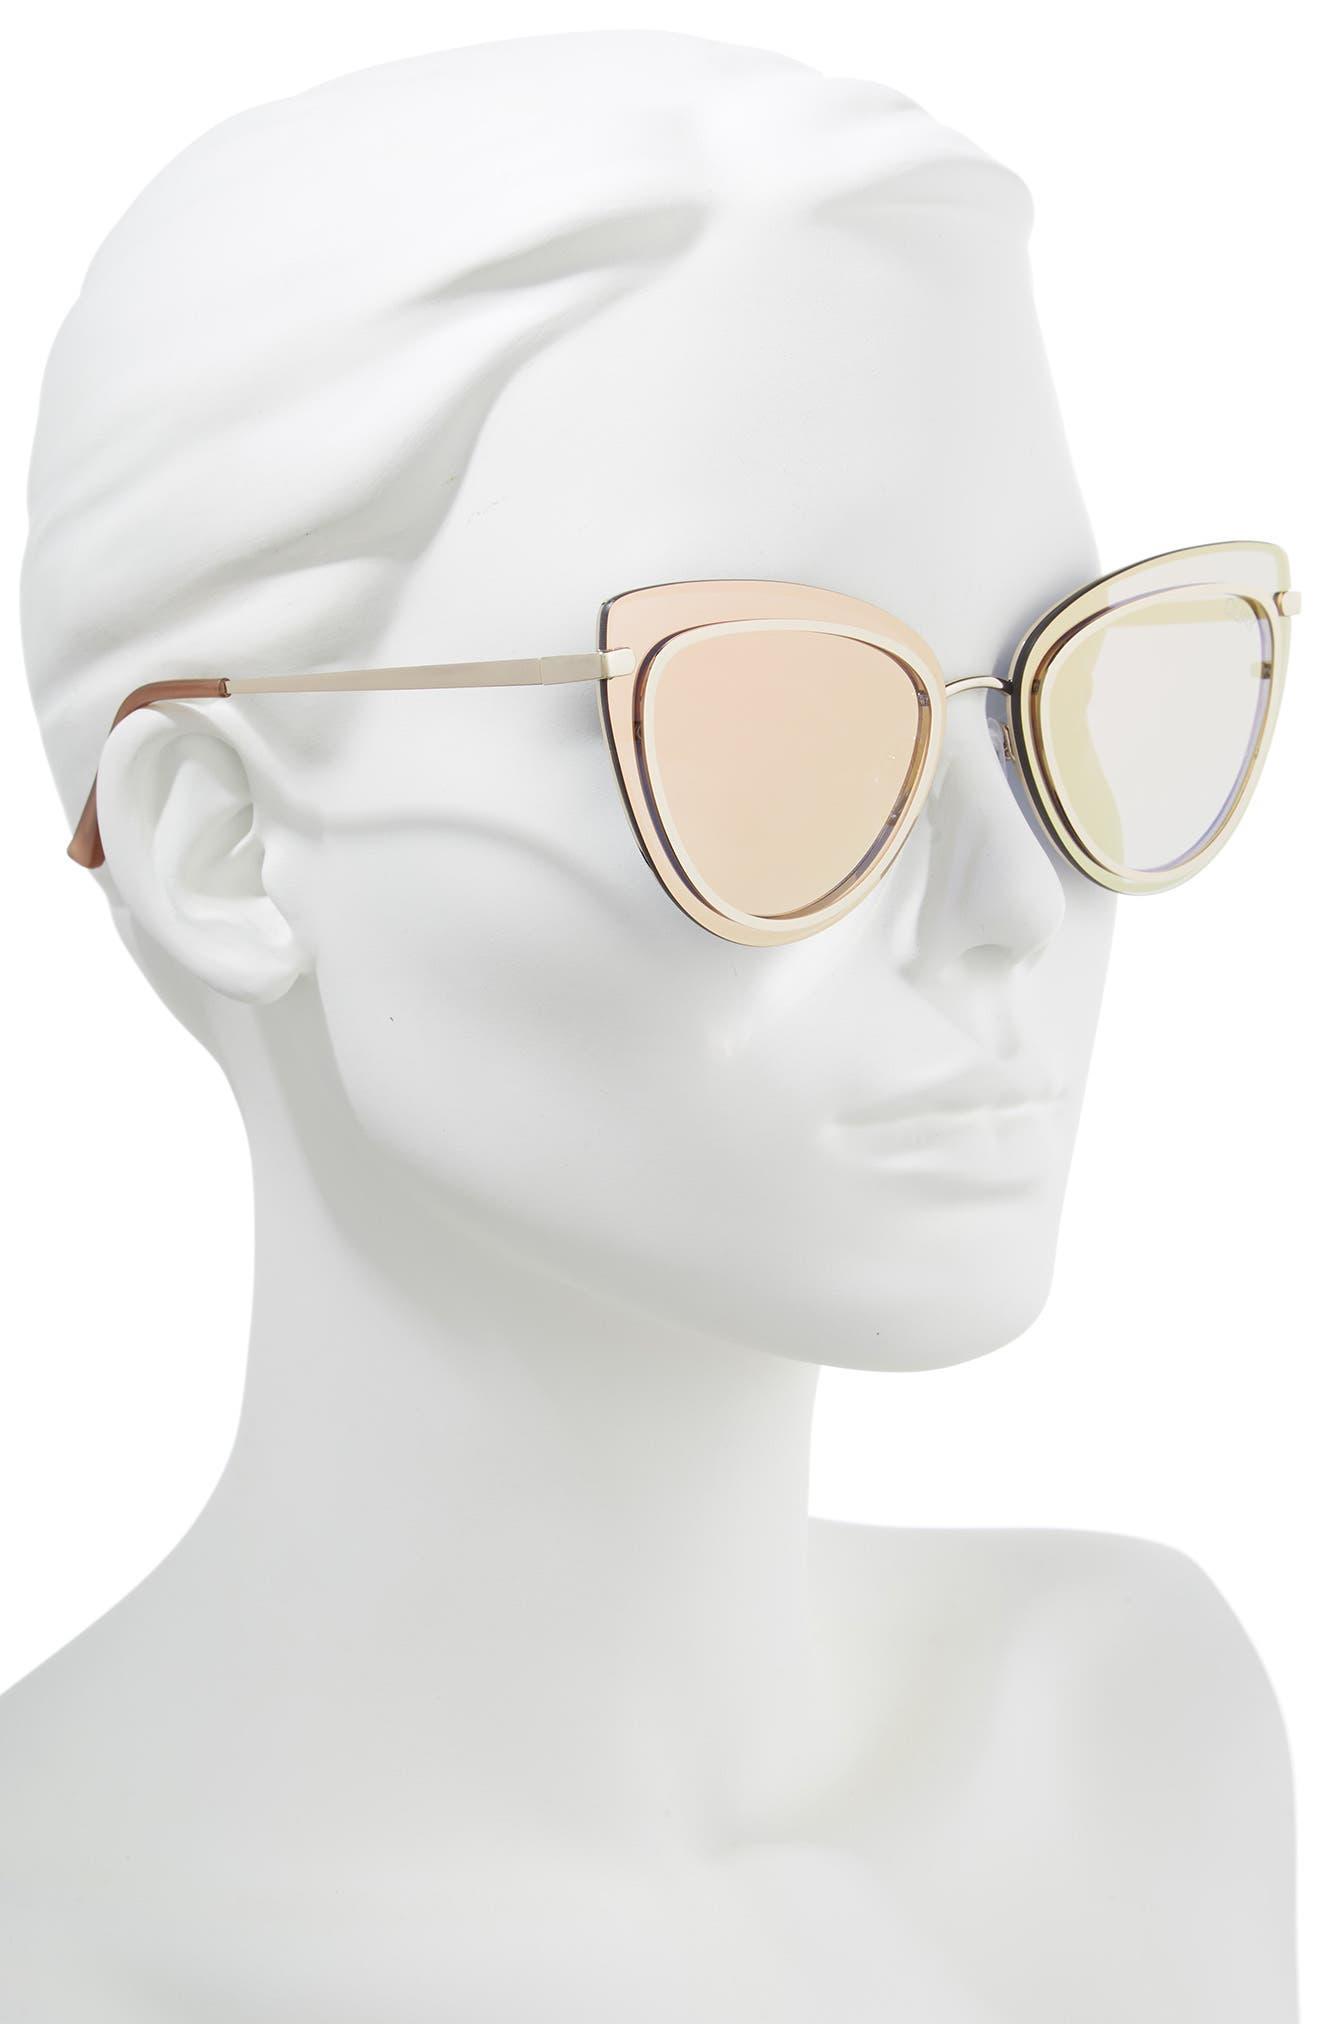 Primrose 55mm Cat Eye Sunglasses,                             Alternate thumbnail 2, color,                             GOLD/ ROSE